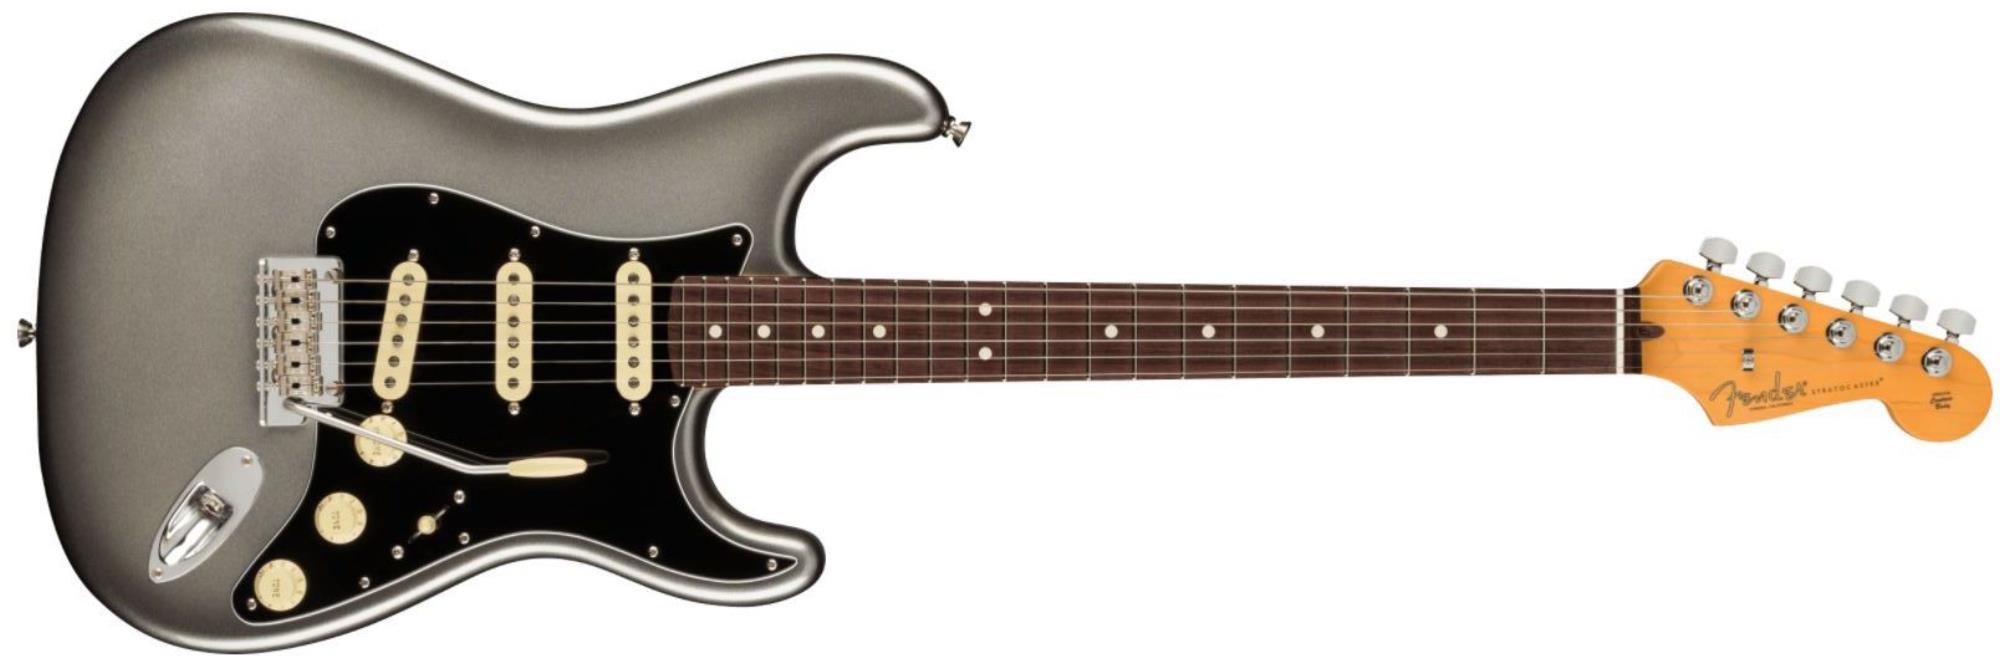 FENDER-American-Professional-Pro-II-Stratocaster-RW-Mercury-0113900755-sku-24448